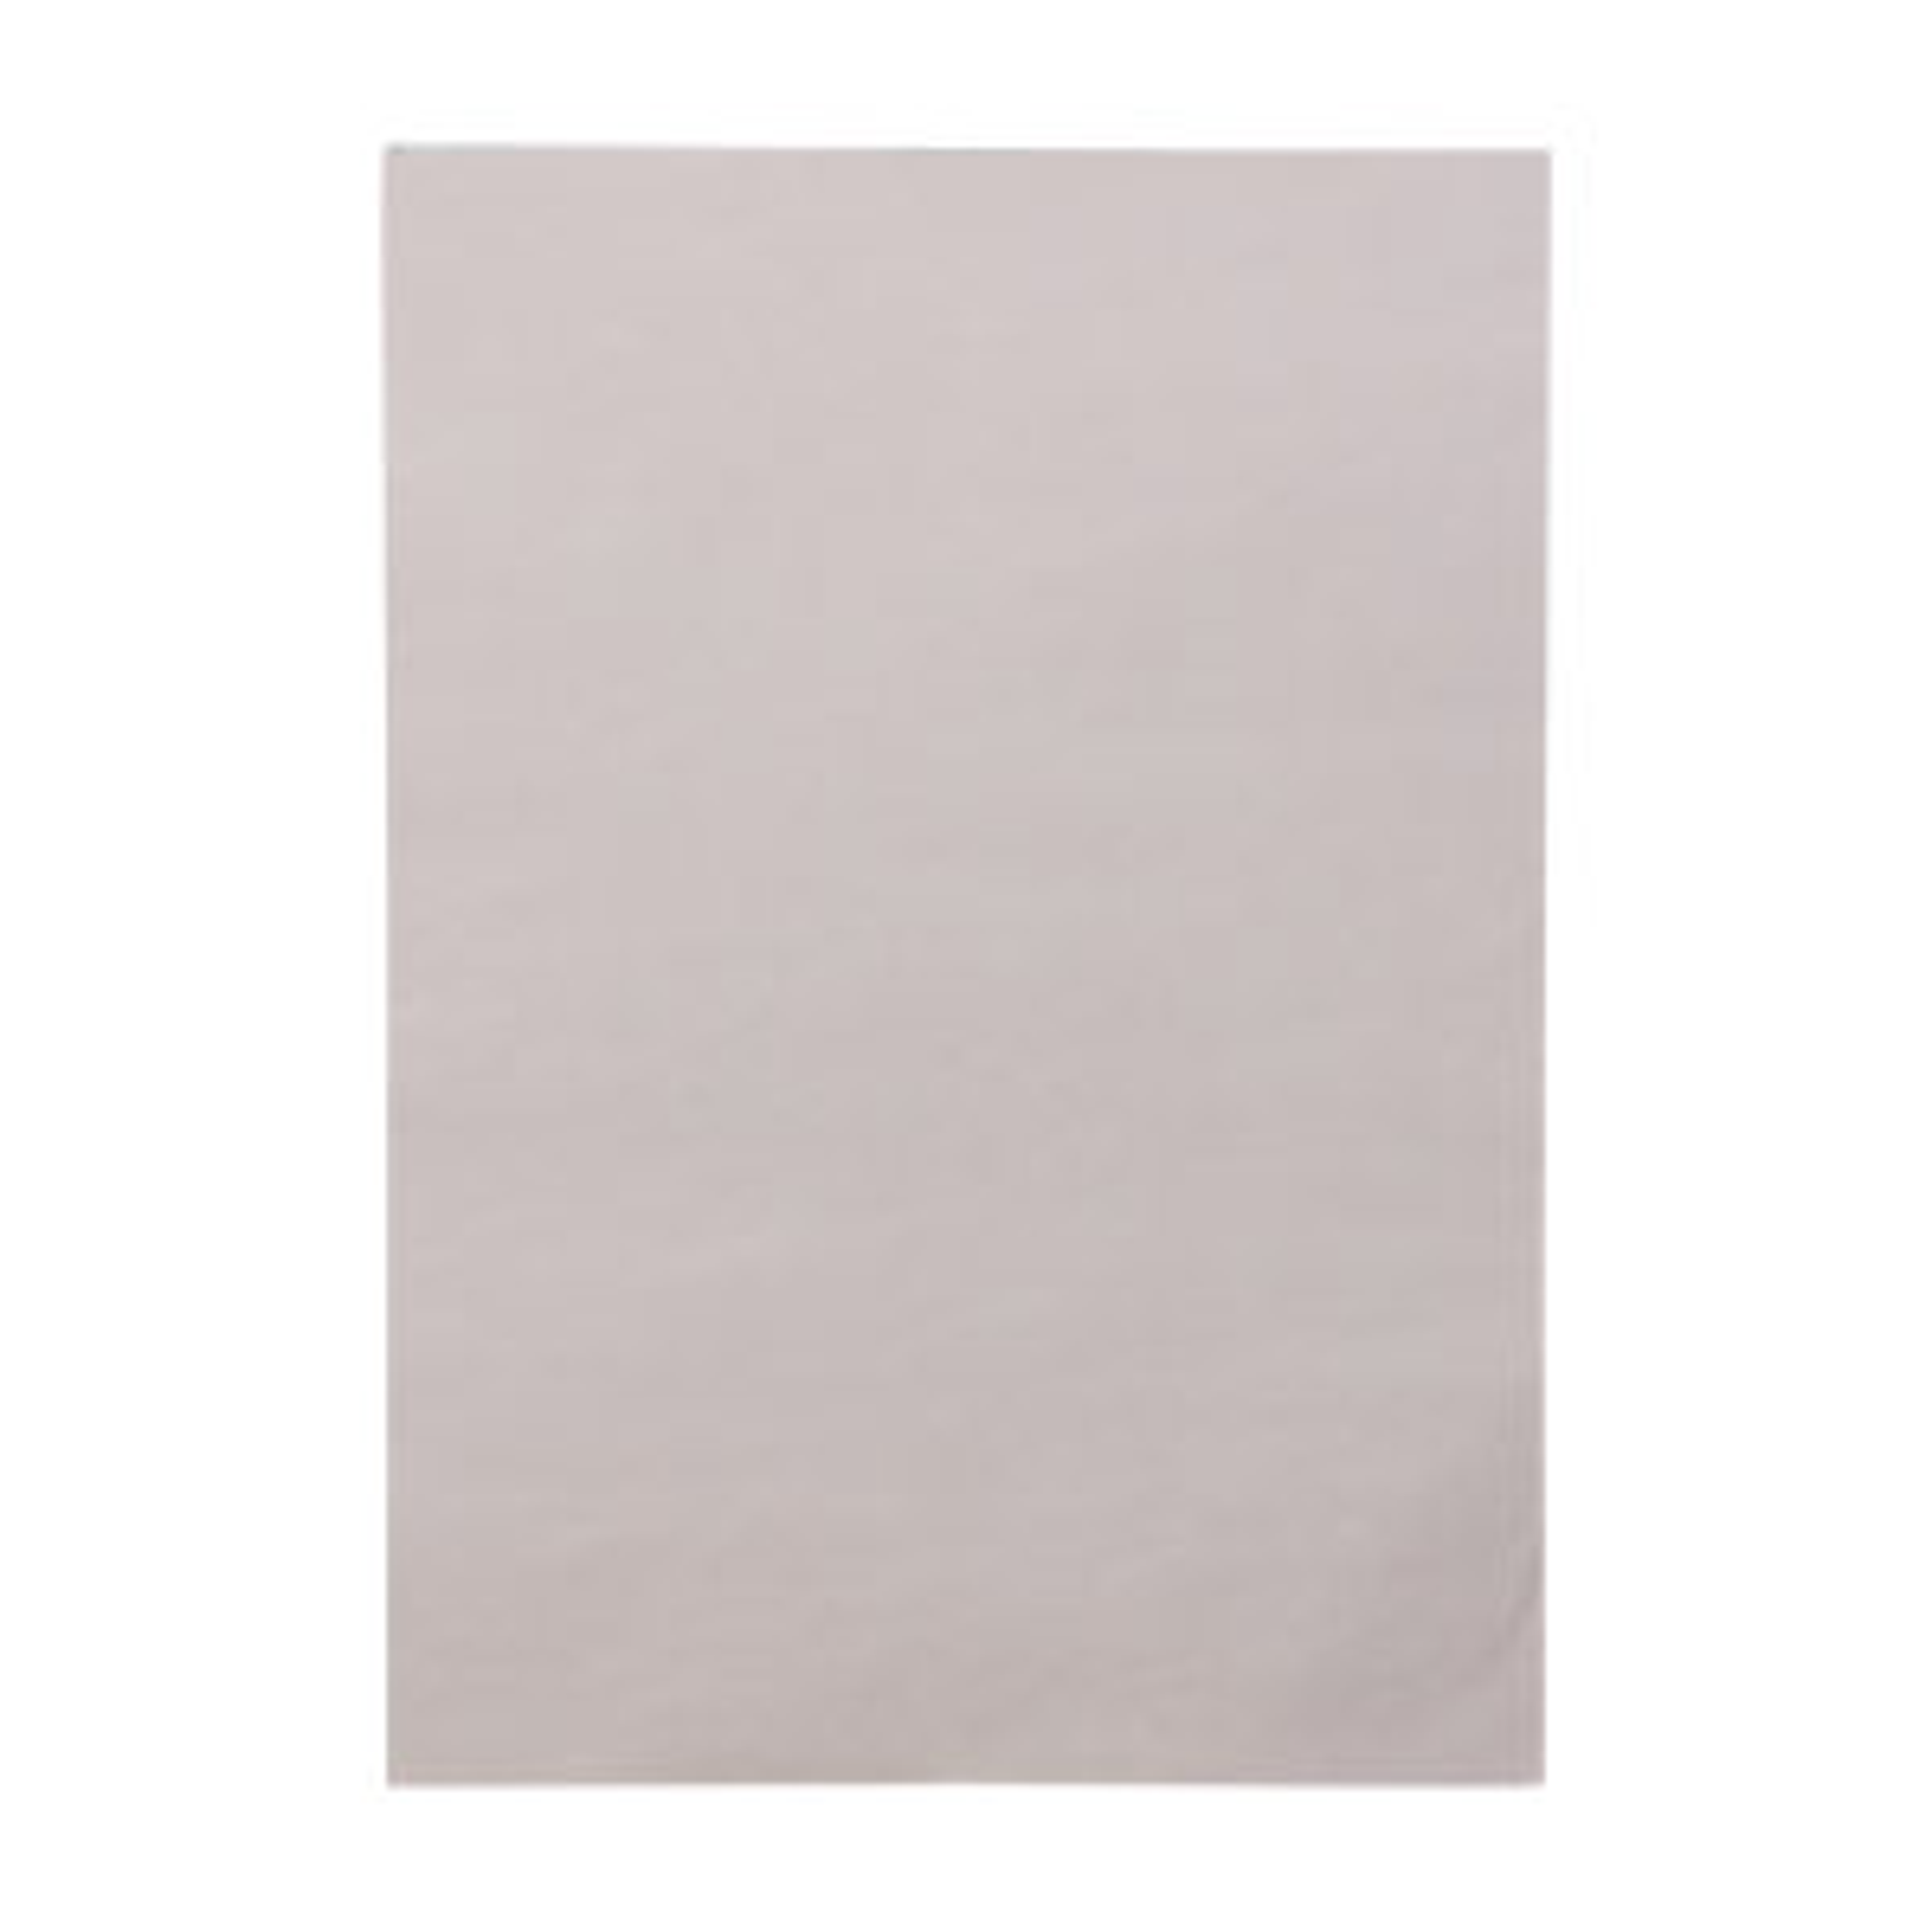 کاغذ A4  کد KK بسته 100 عددی